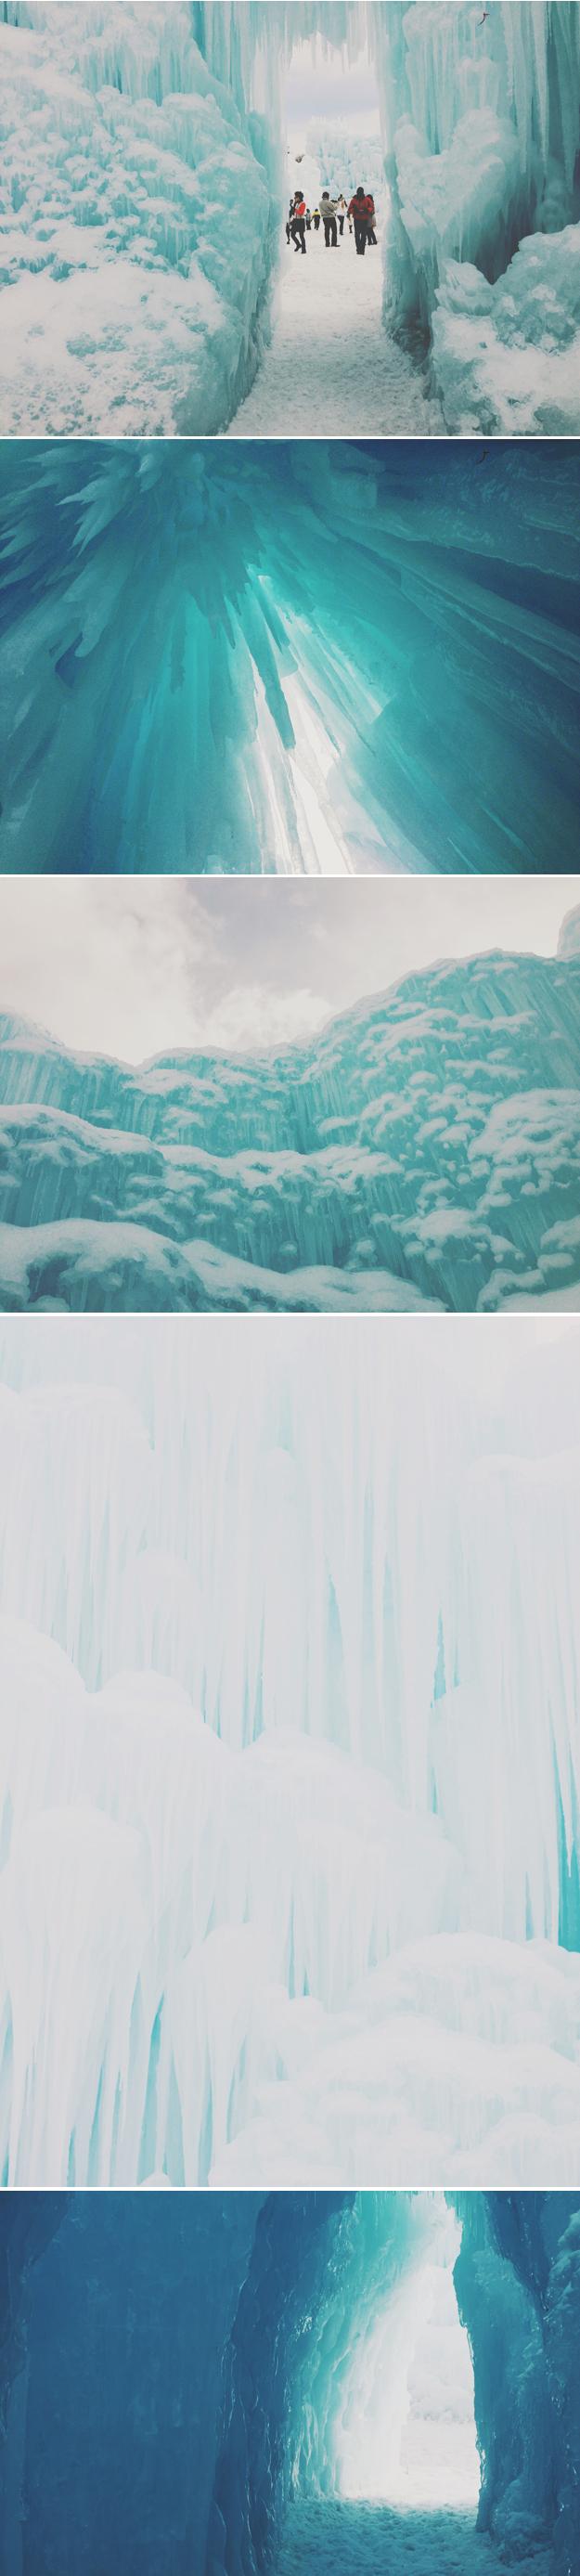 Midway-Ice-Castles-2.jpg